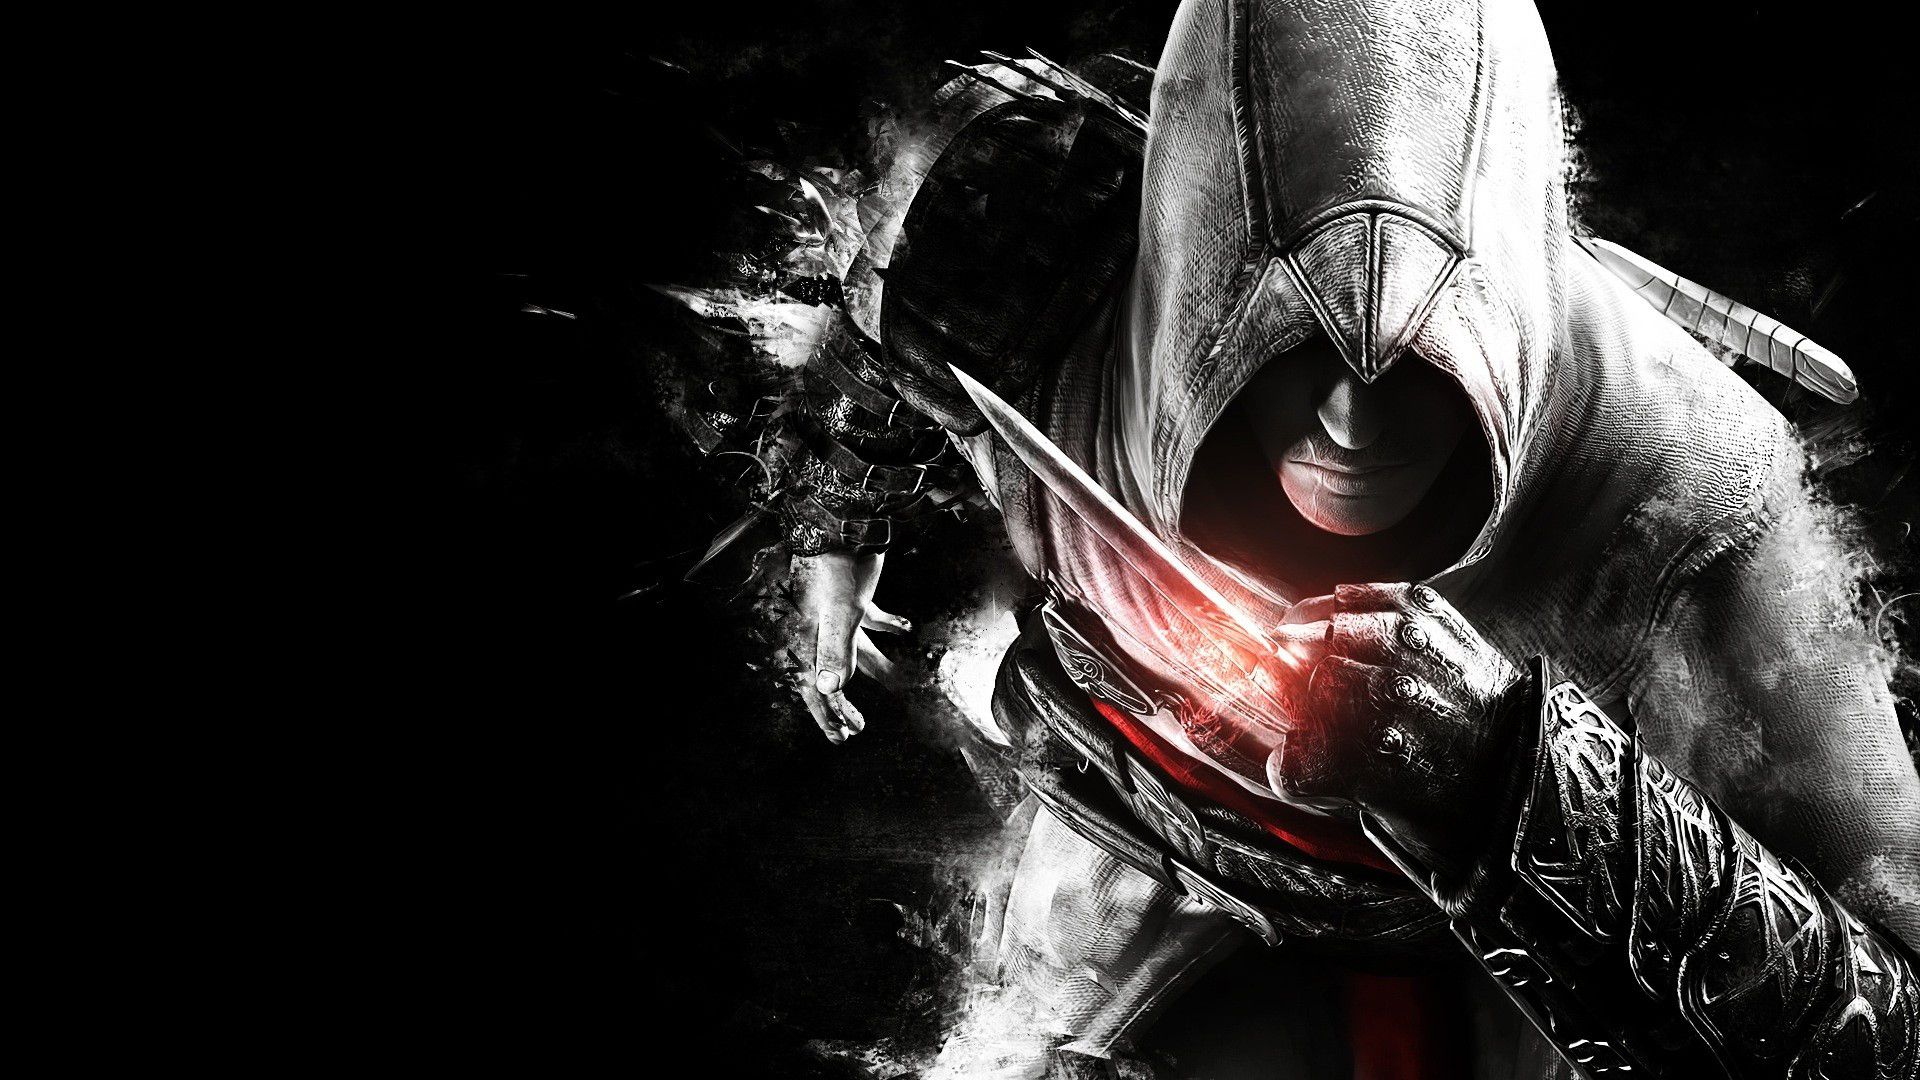 Pin by Ovidiu Drobotă on WallPapers | Assassin's creed wallpaper, Assassins creed anime ...